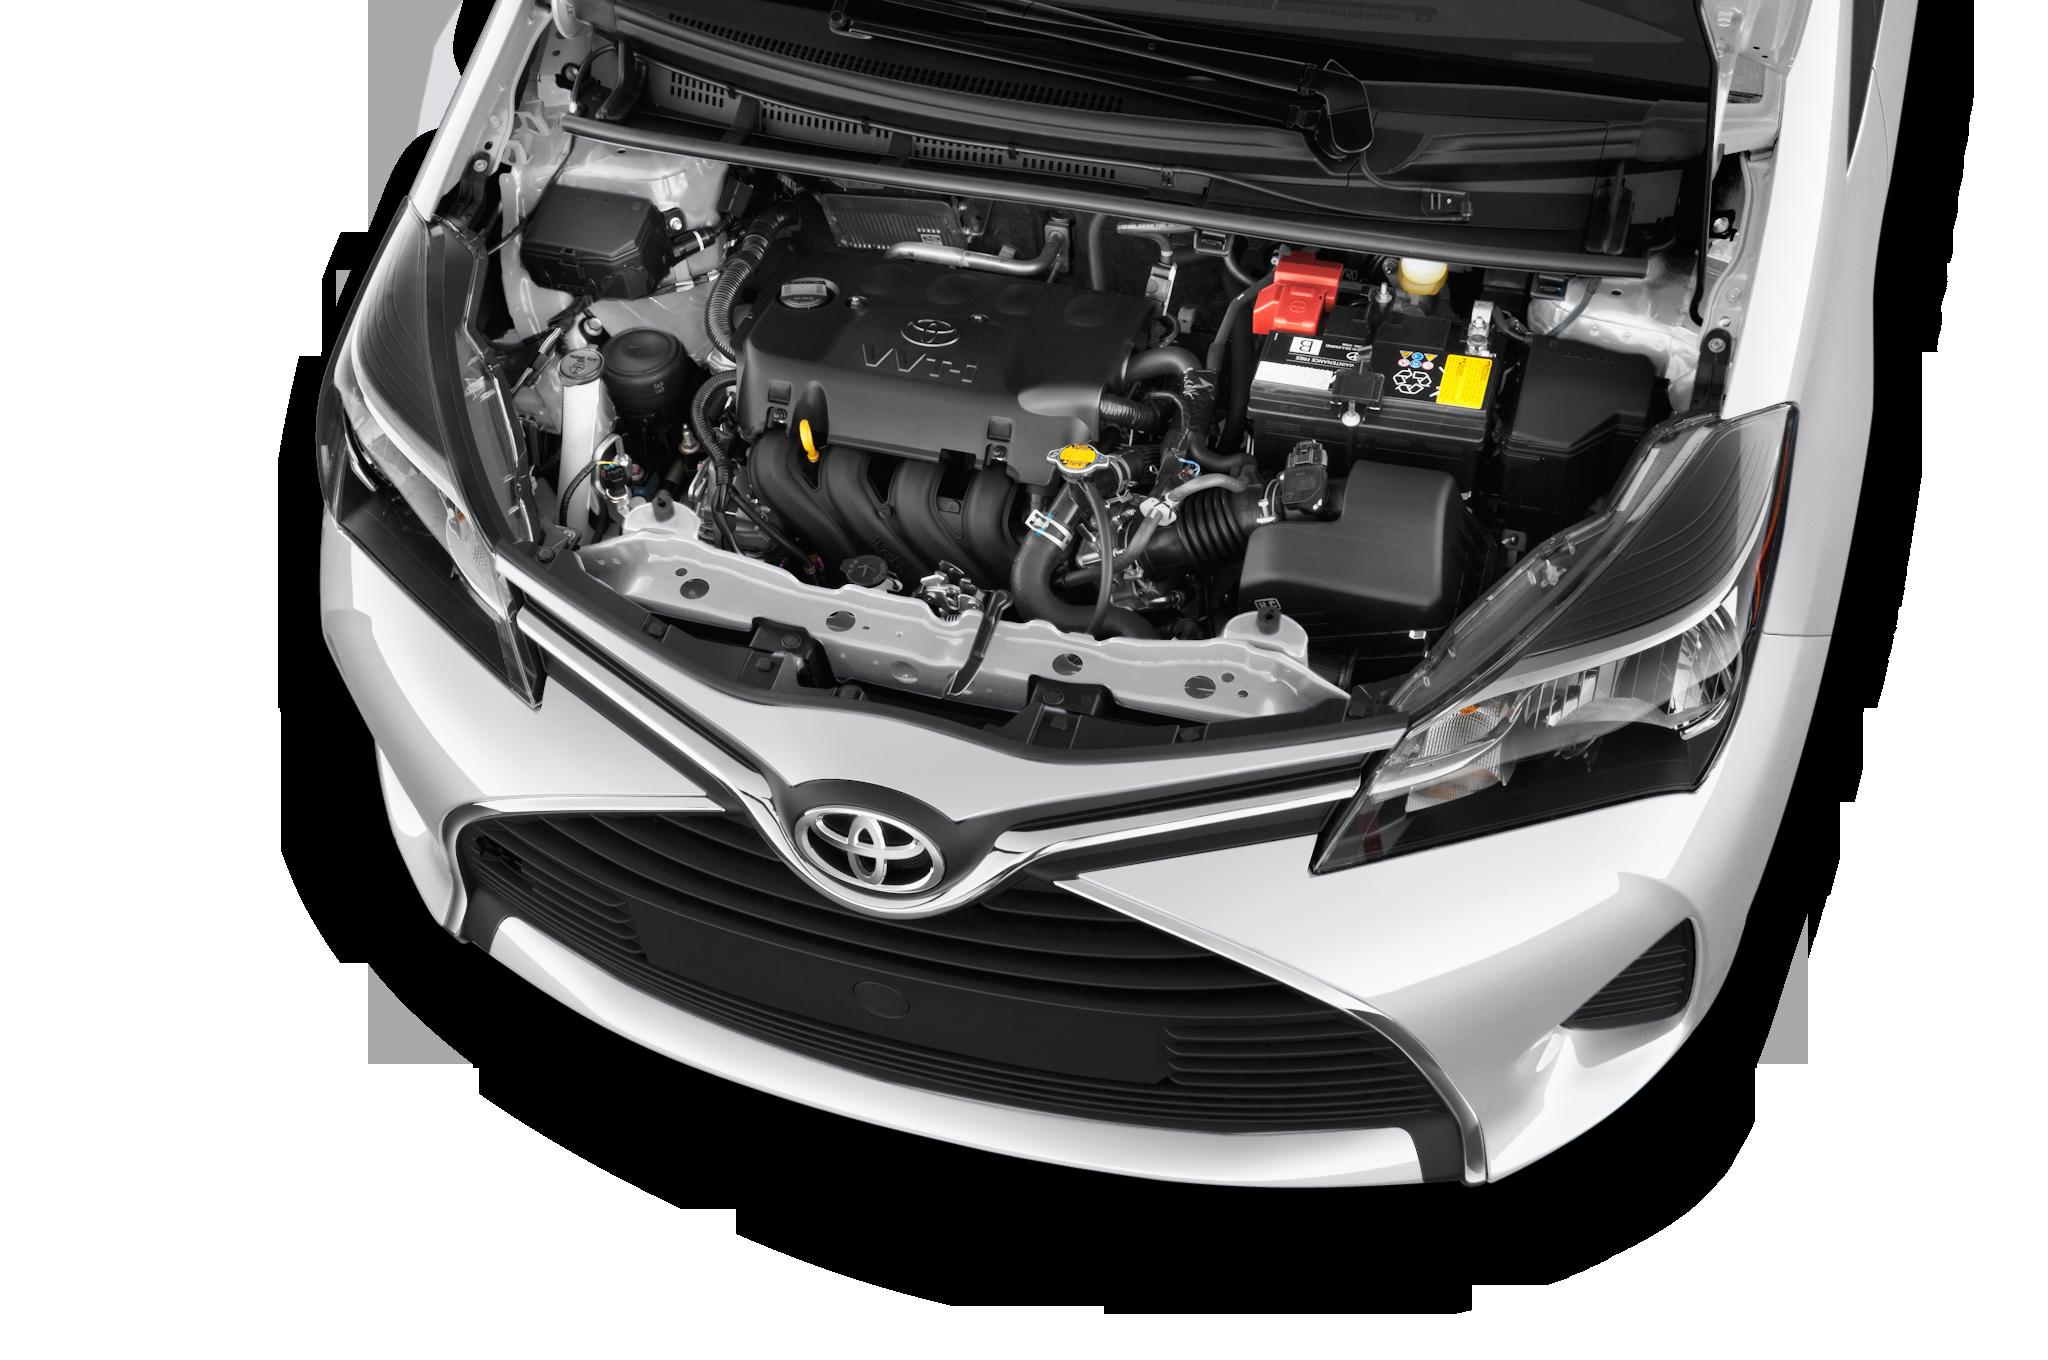 Toyota Yaris Engine Wiring Harness : Toyota yaris refreshed